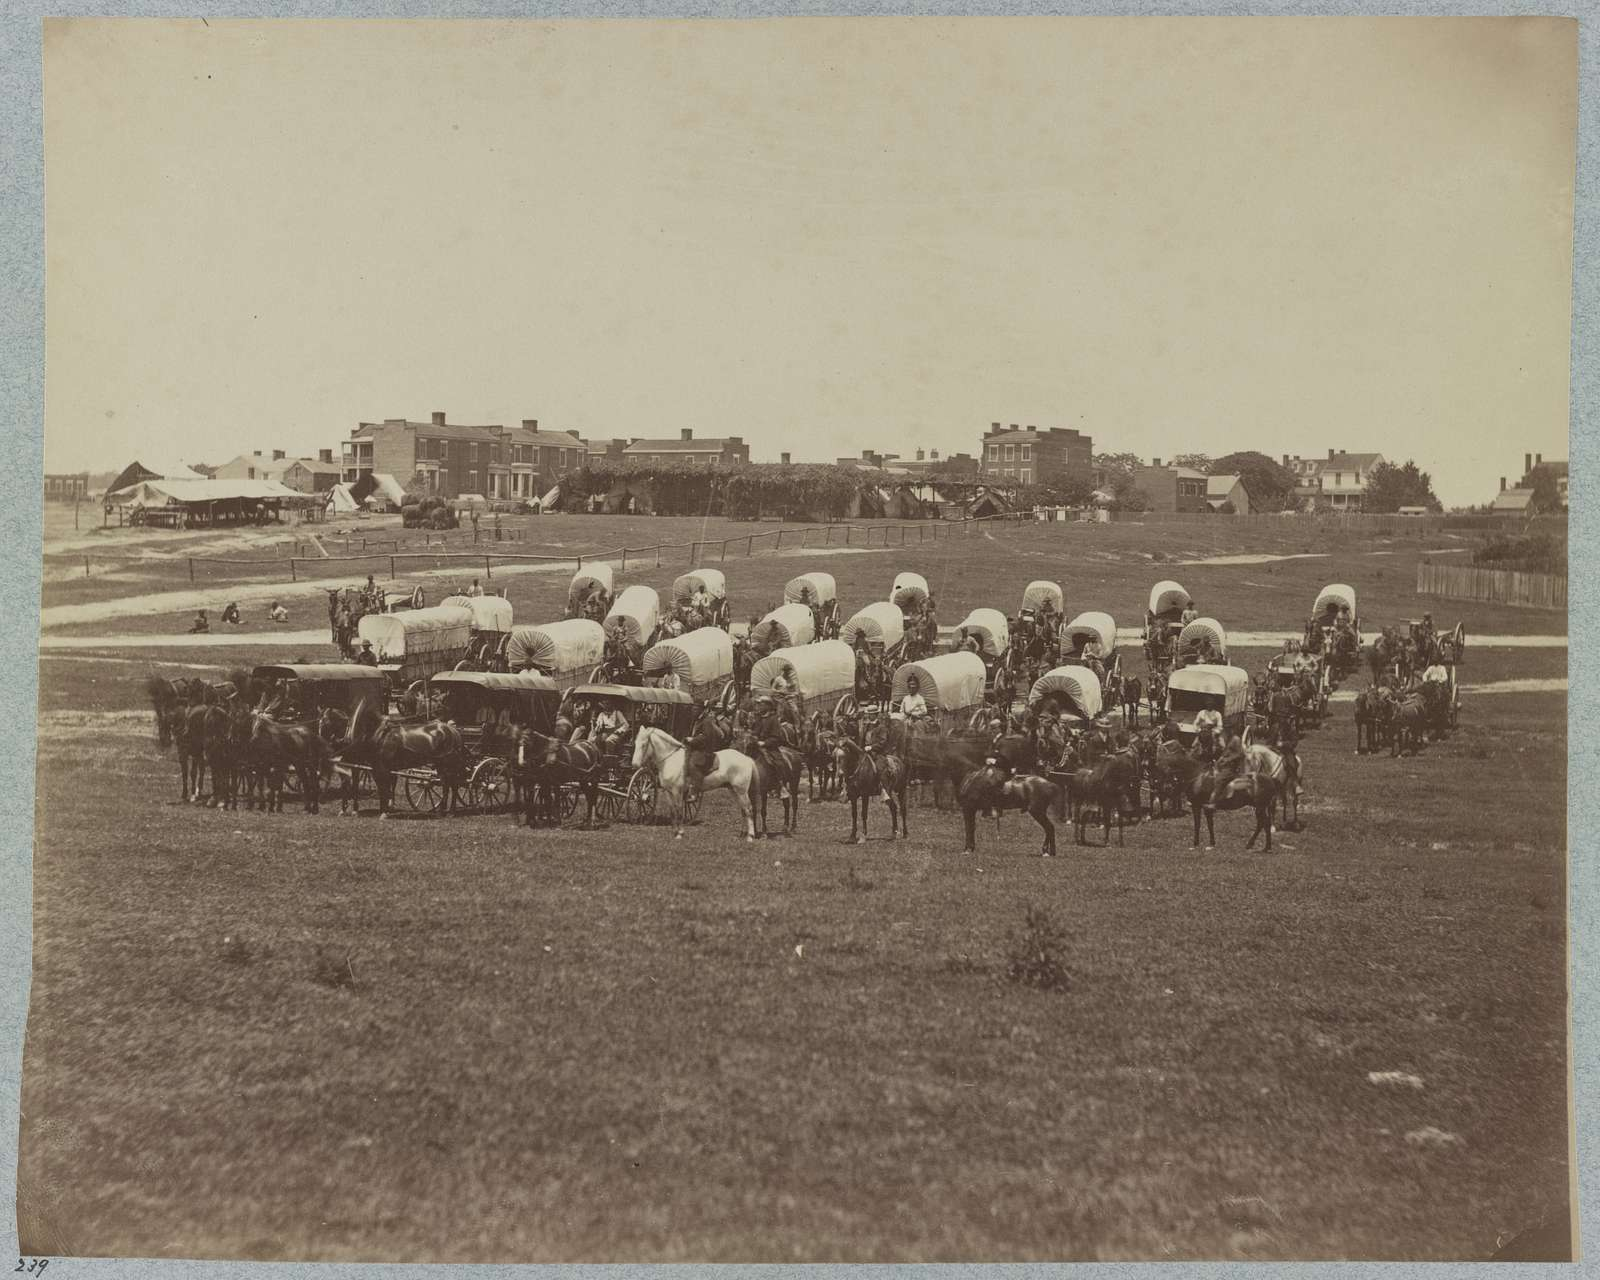 Wagon train of U.S. Military Telegraph Corps, Richmond, Va., April, 1865